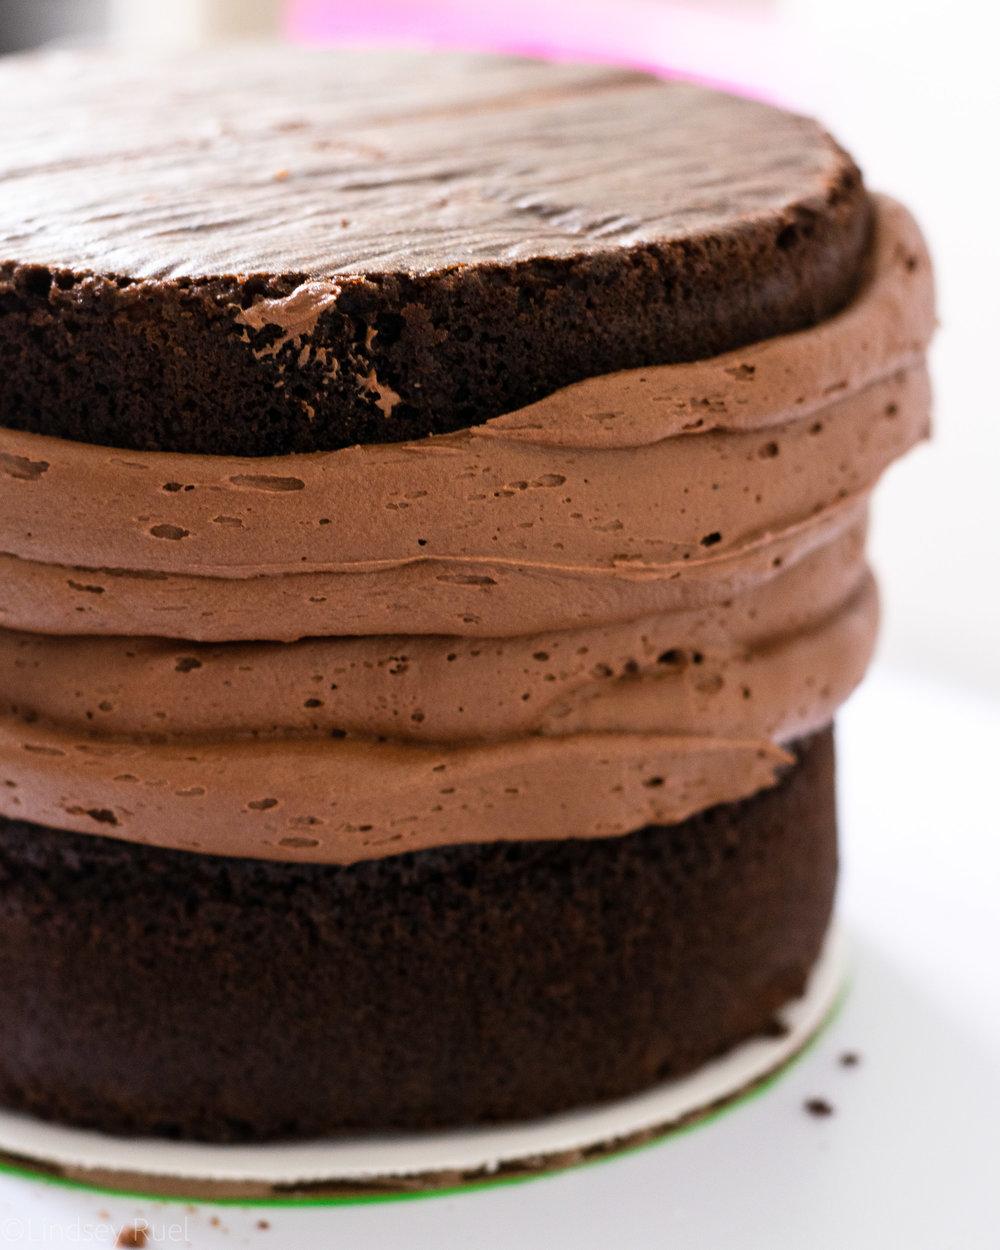 Haunted House Cookie Cake-4.jpg